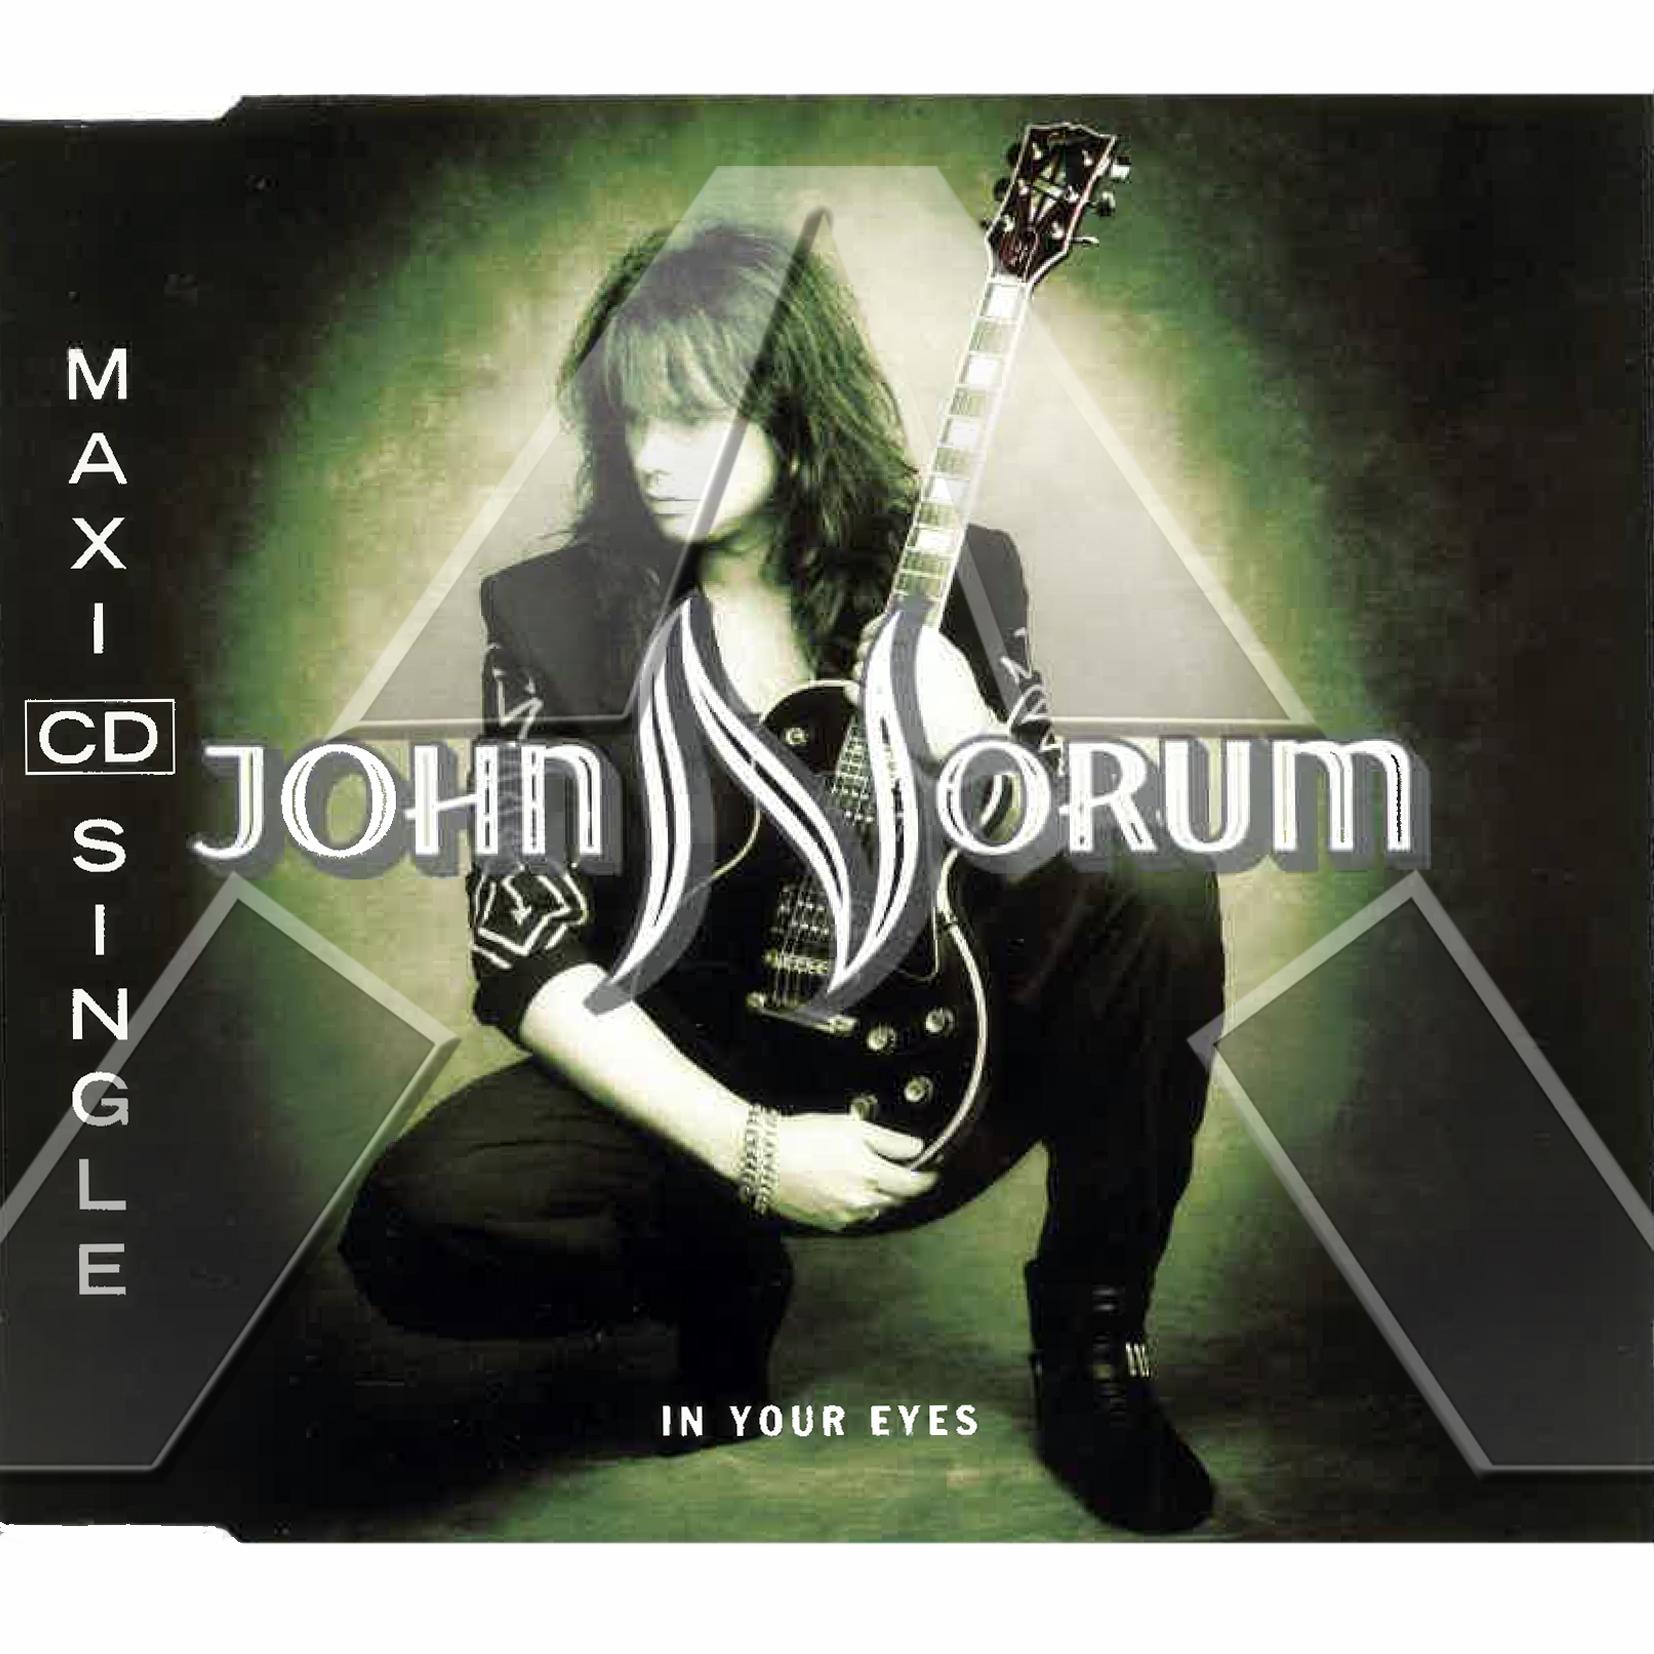 John Norum ★ In Your Eyes (cd maxi single EU)